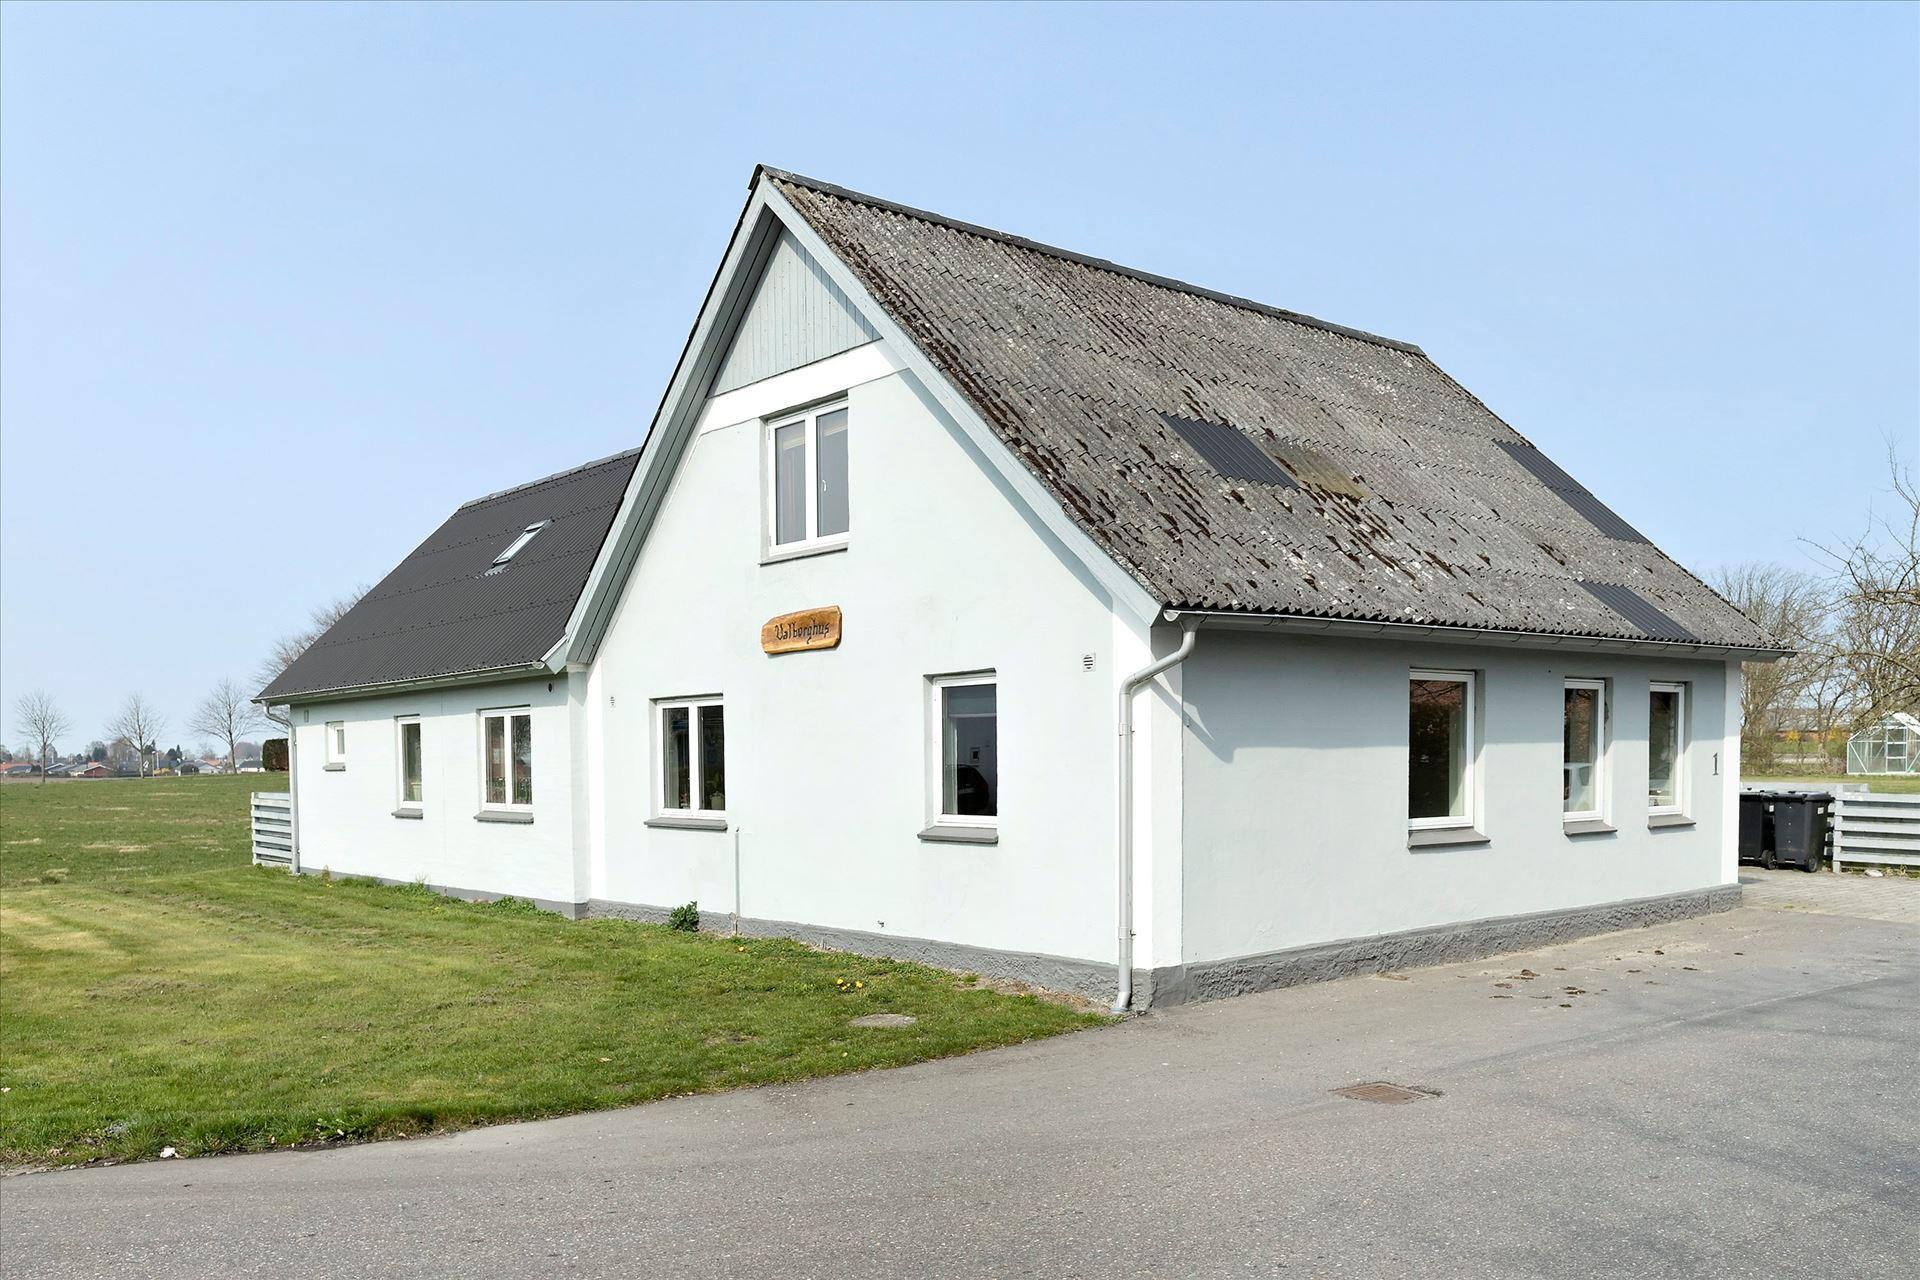 Dyssehøjvej 1, Jennum, 8981 Spentrup